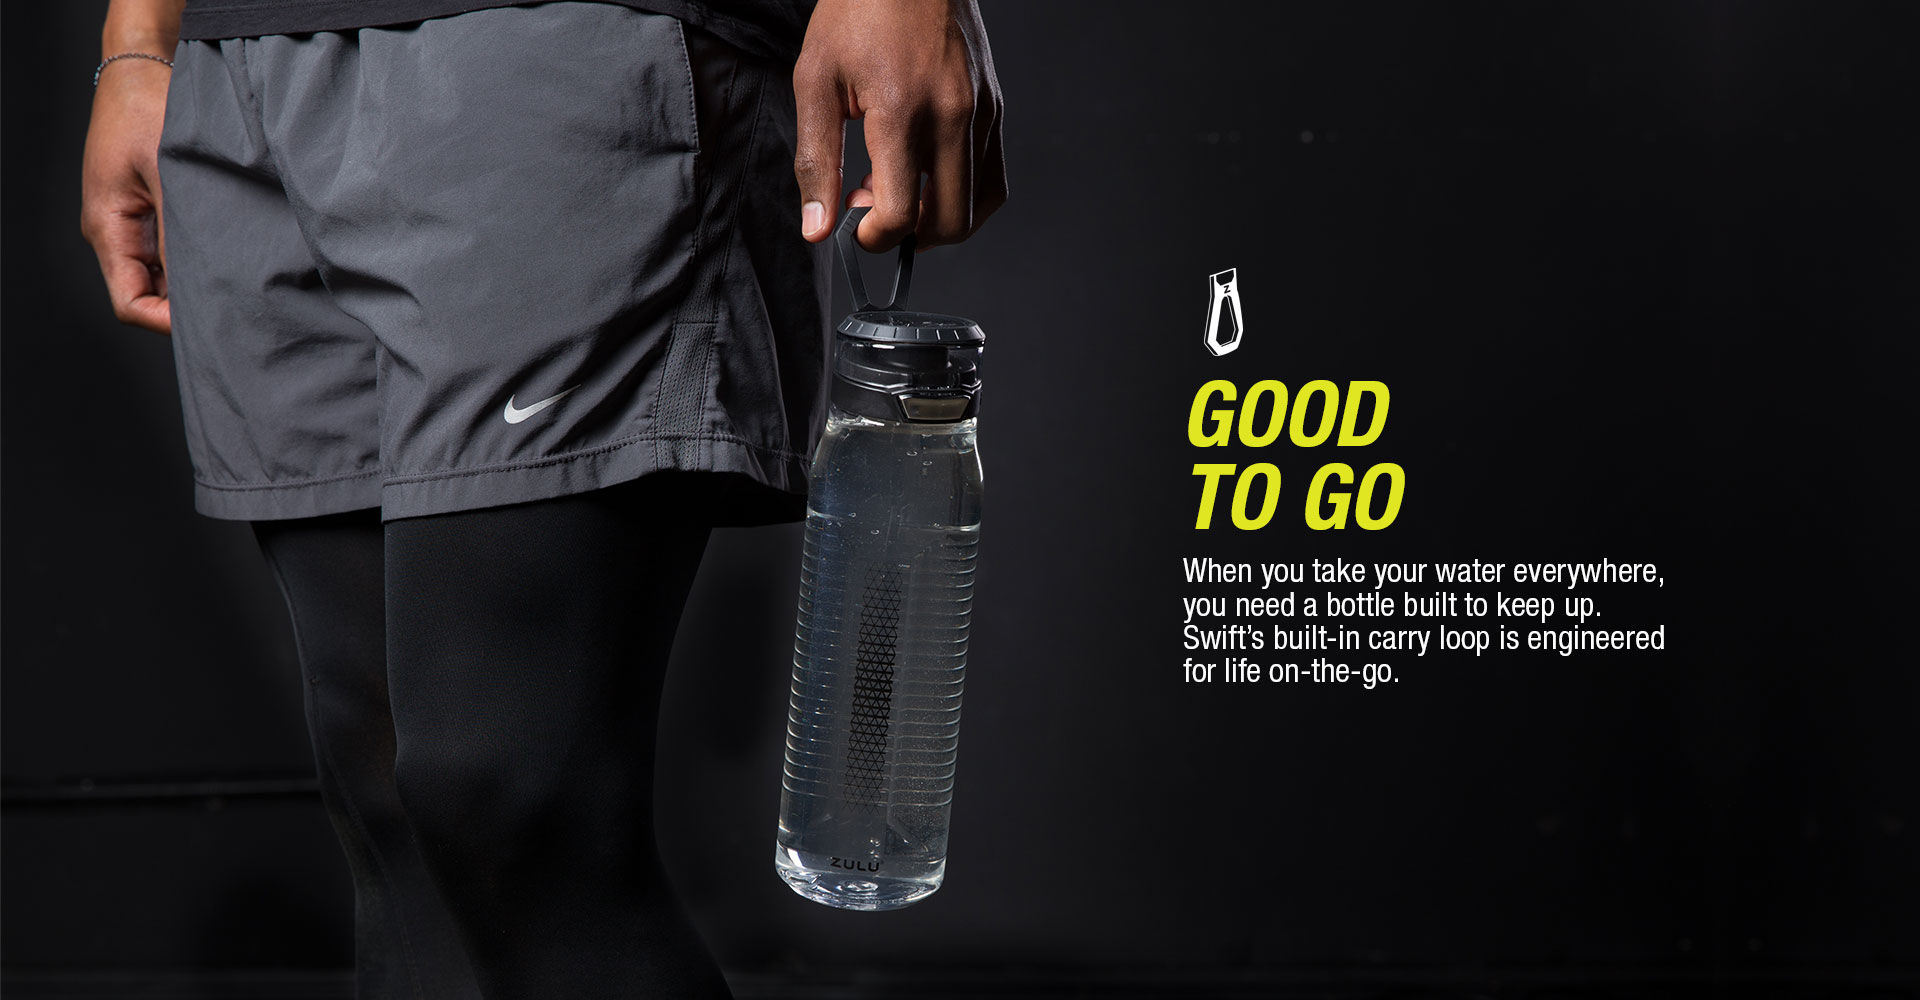 2019.01.29_Zulu_Swift-Water-Bottle_Banner01_GoodToGo_CarryLoop.jpg